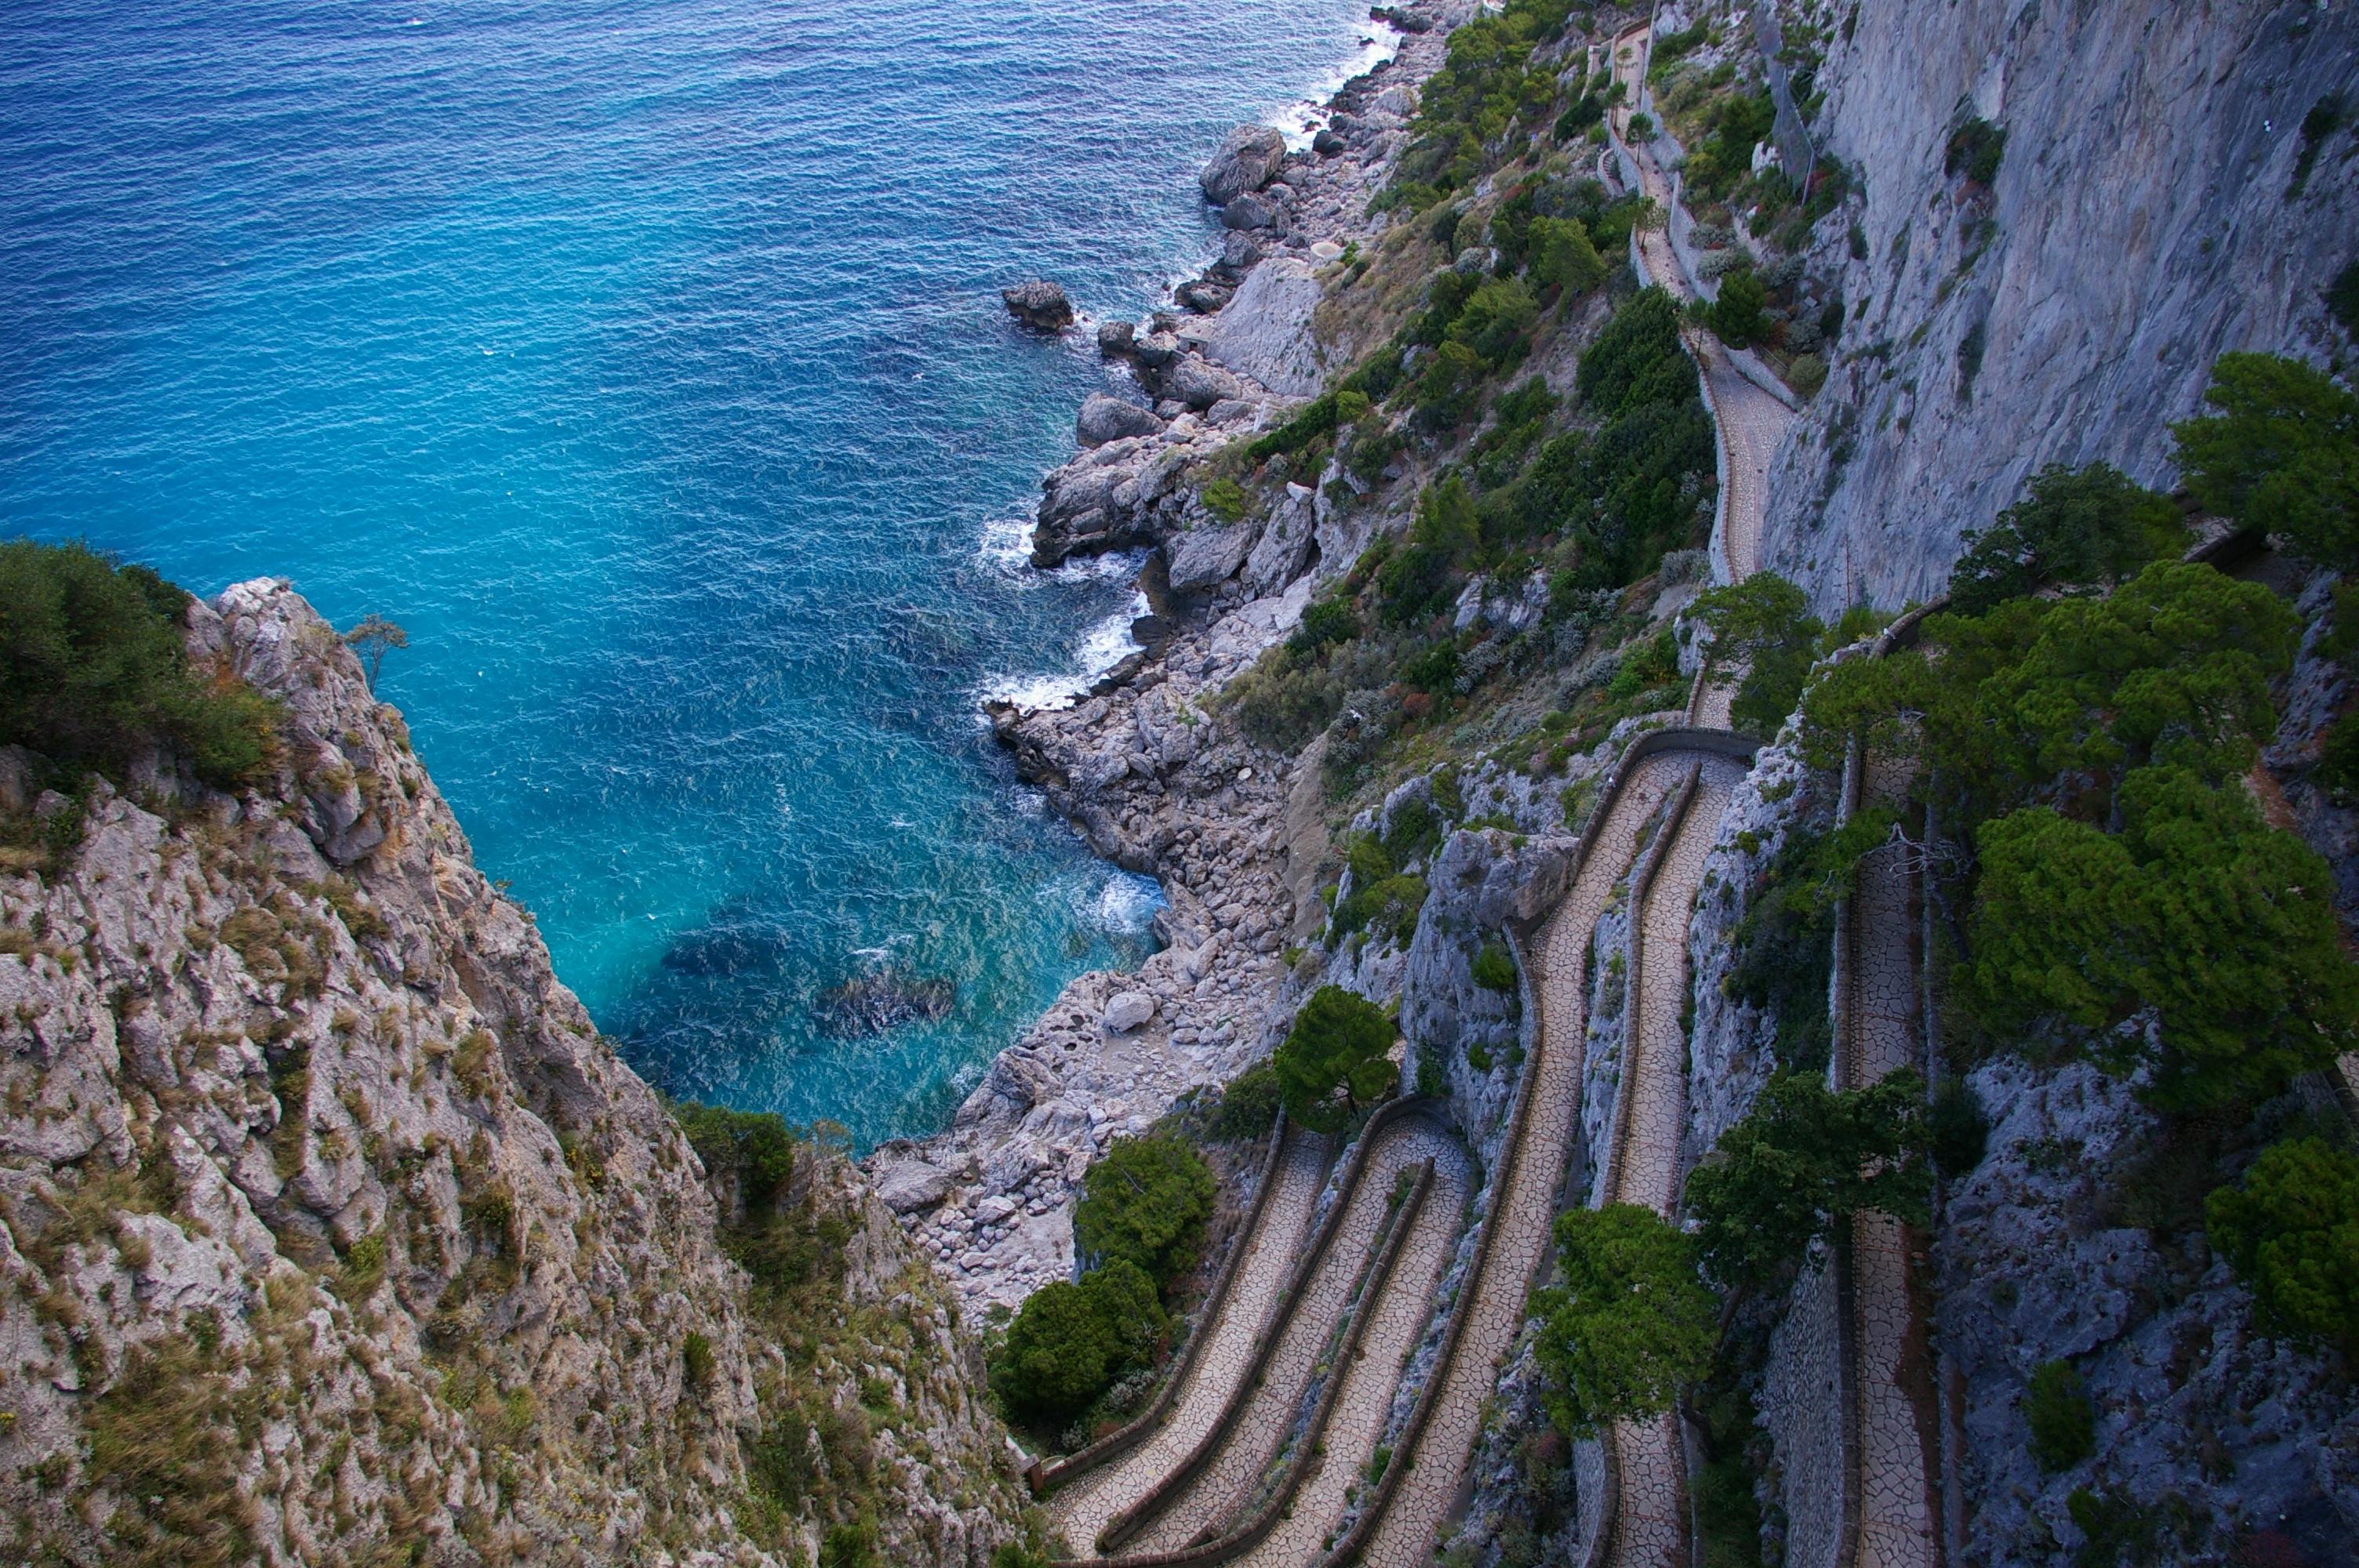 Amalfi_Capri_Tourissimo_3.jpg